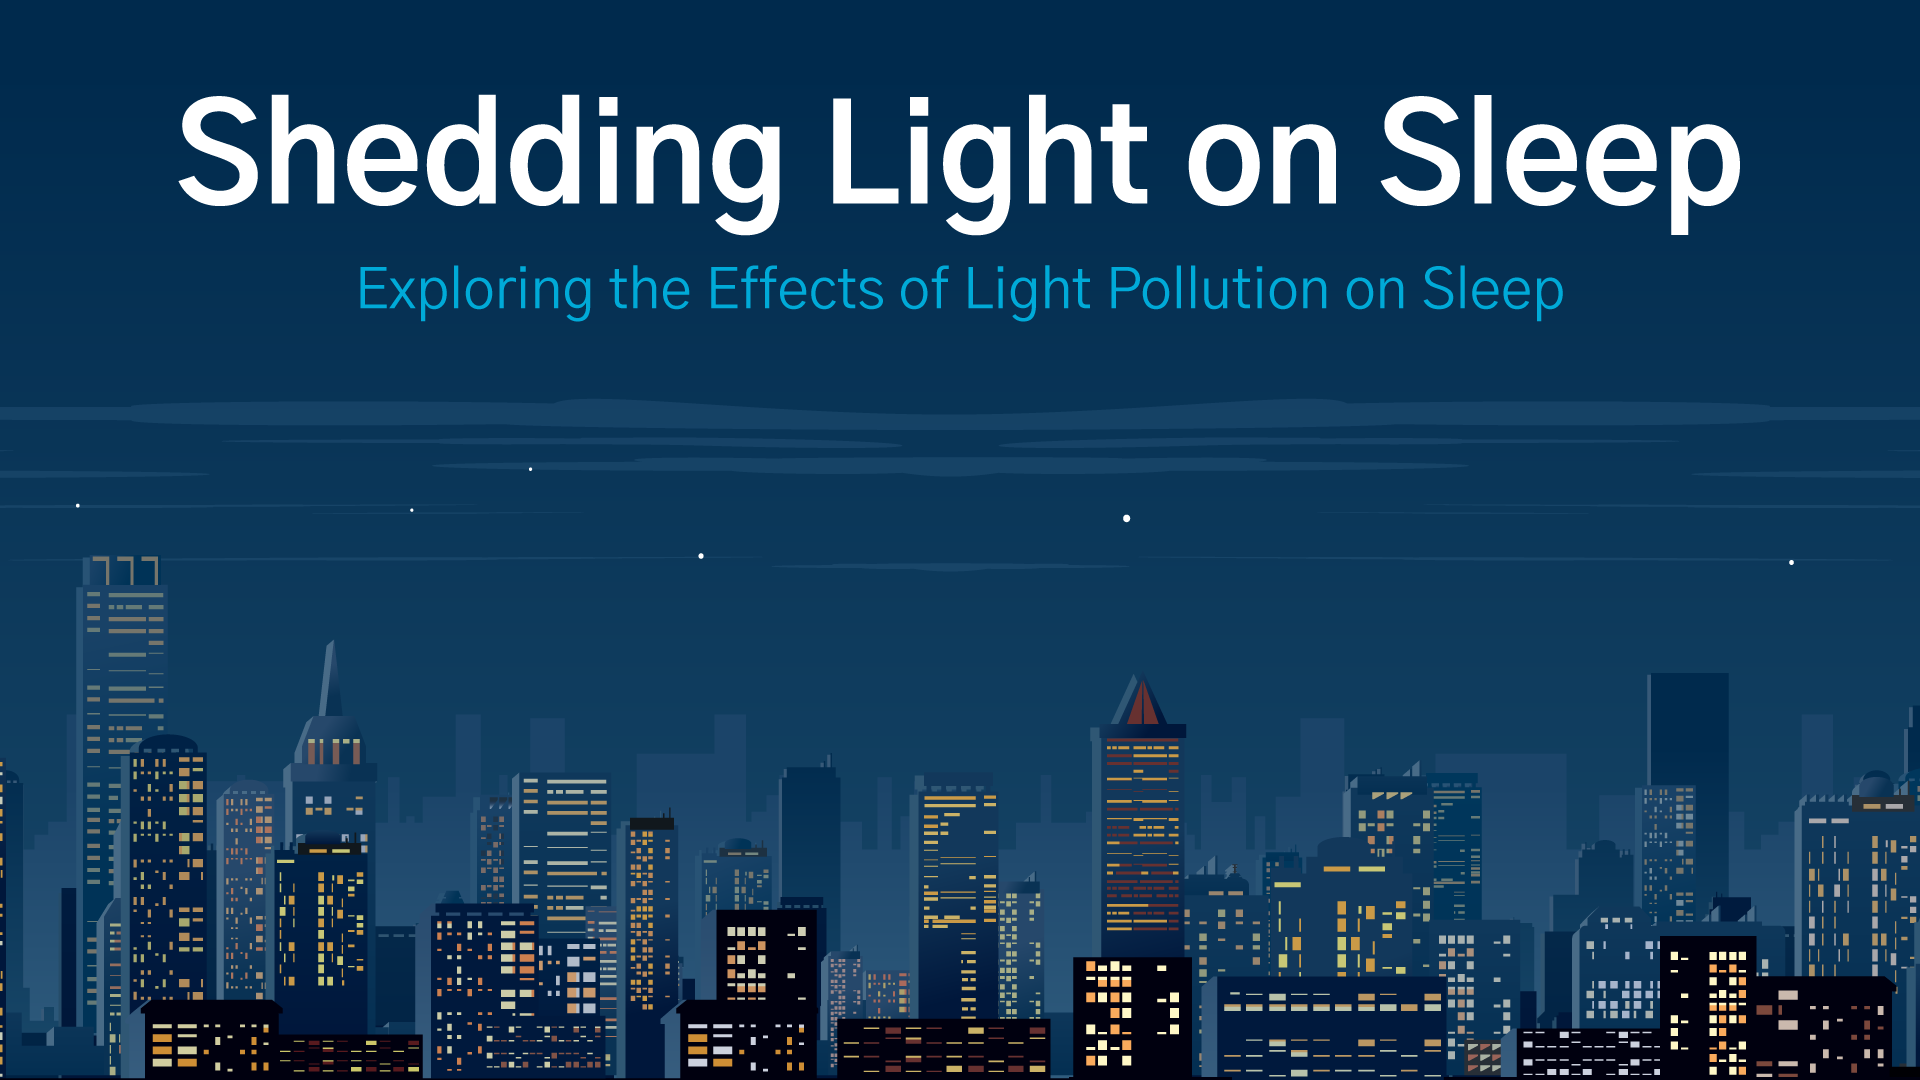 shedding light on sleep